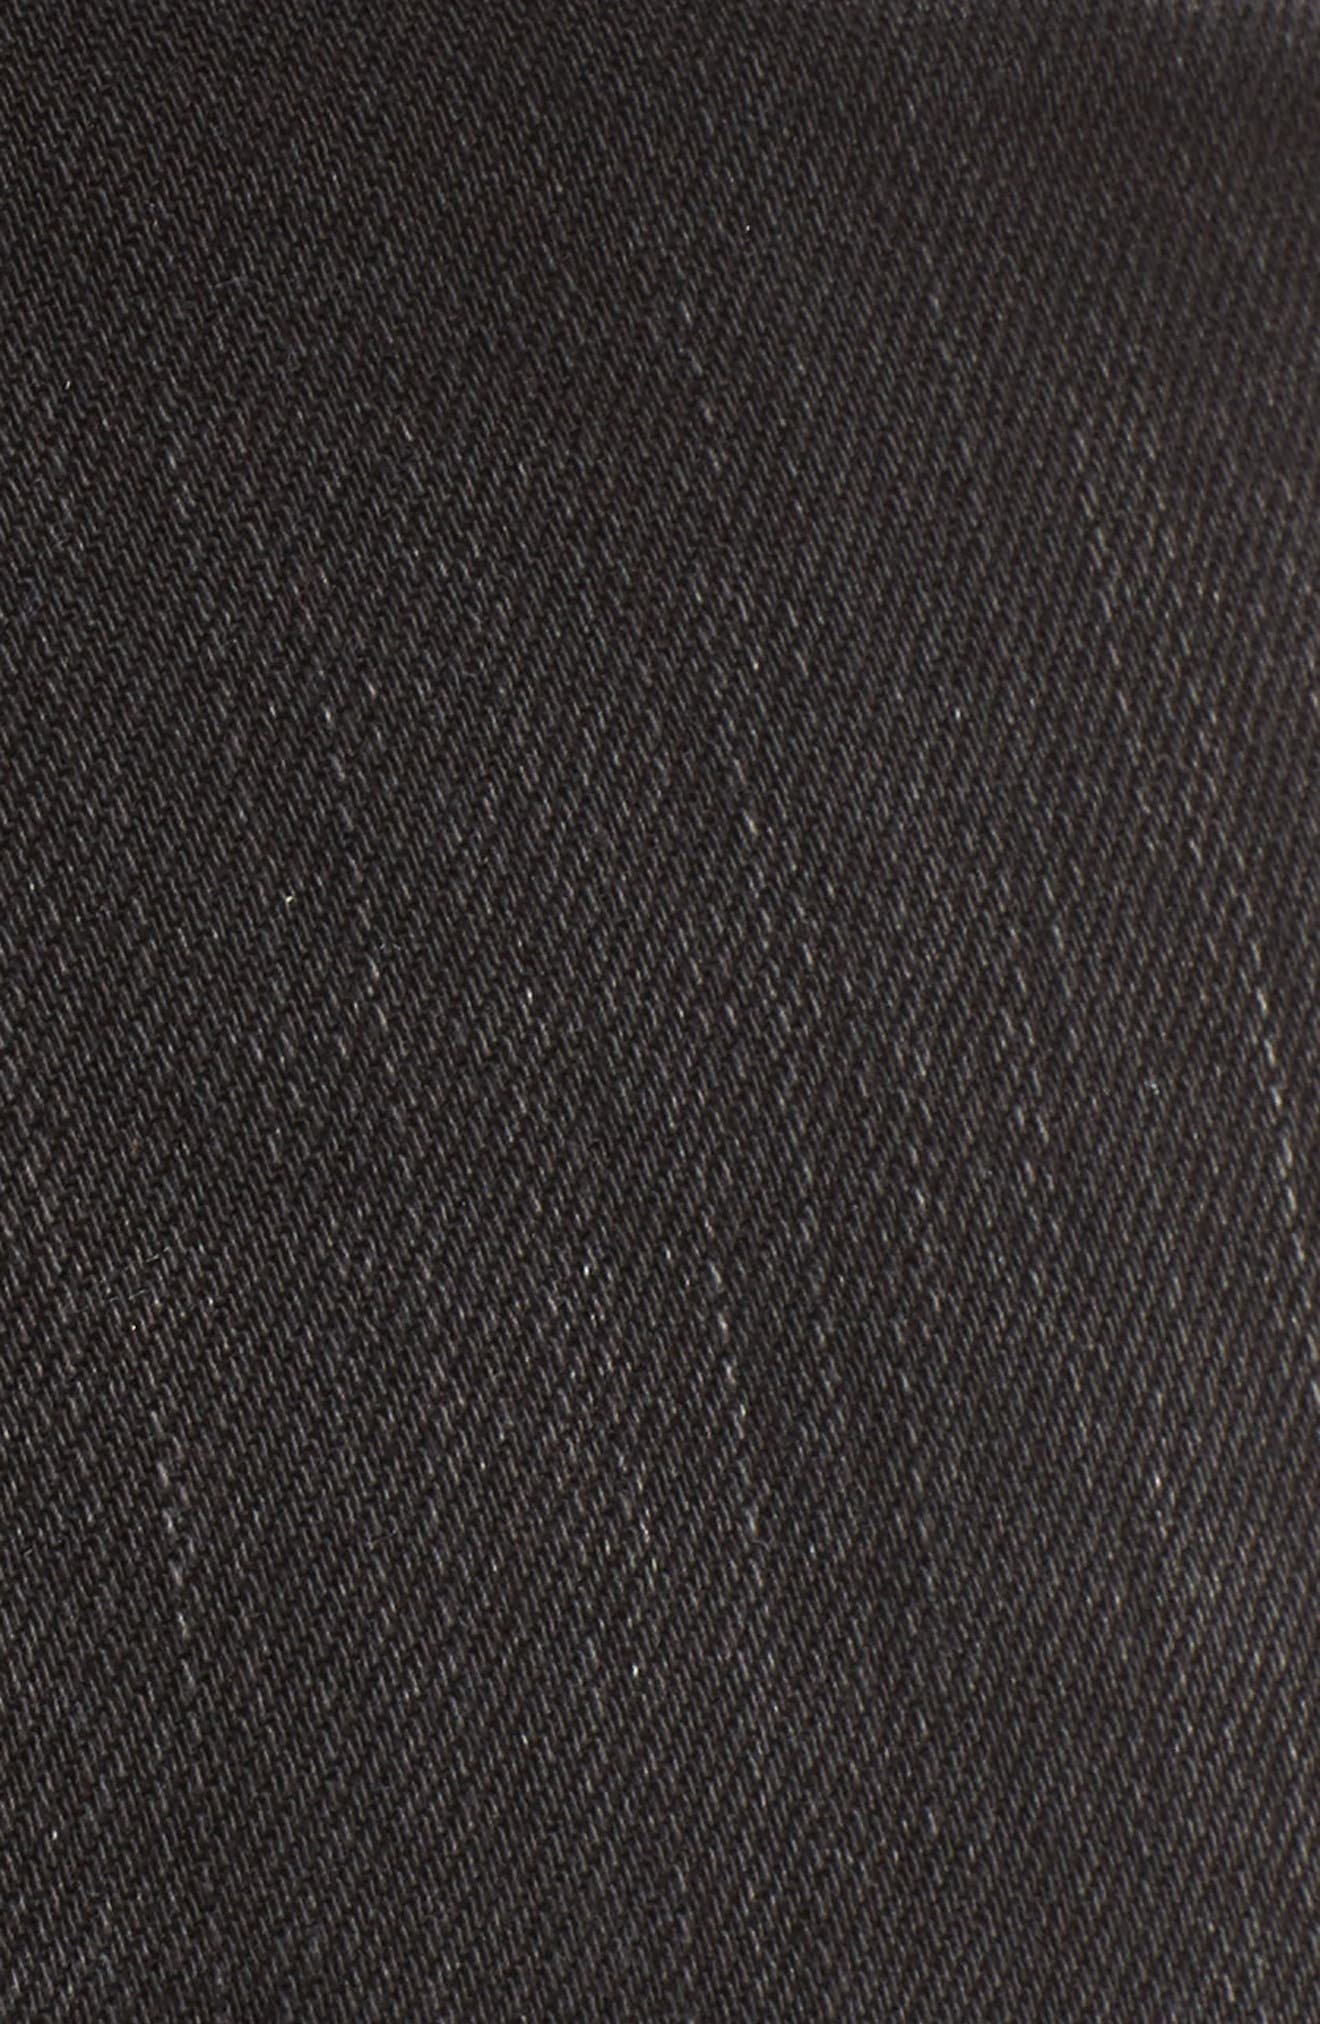 Harlets Cuffed Denim Shorts,                             Alternate thumbnail 5, color,                             Superstar Black